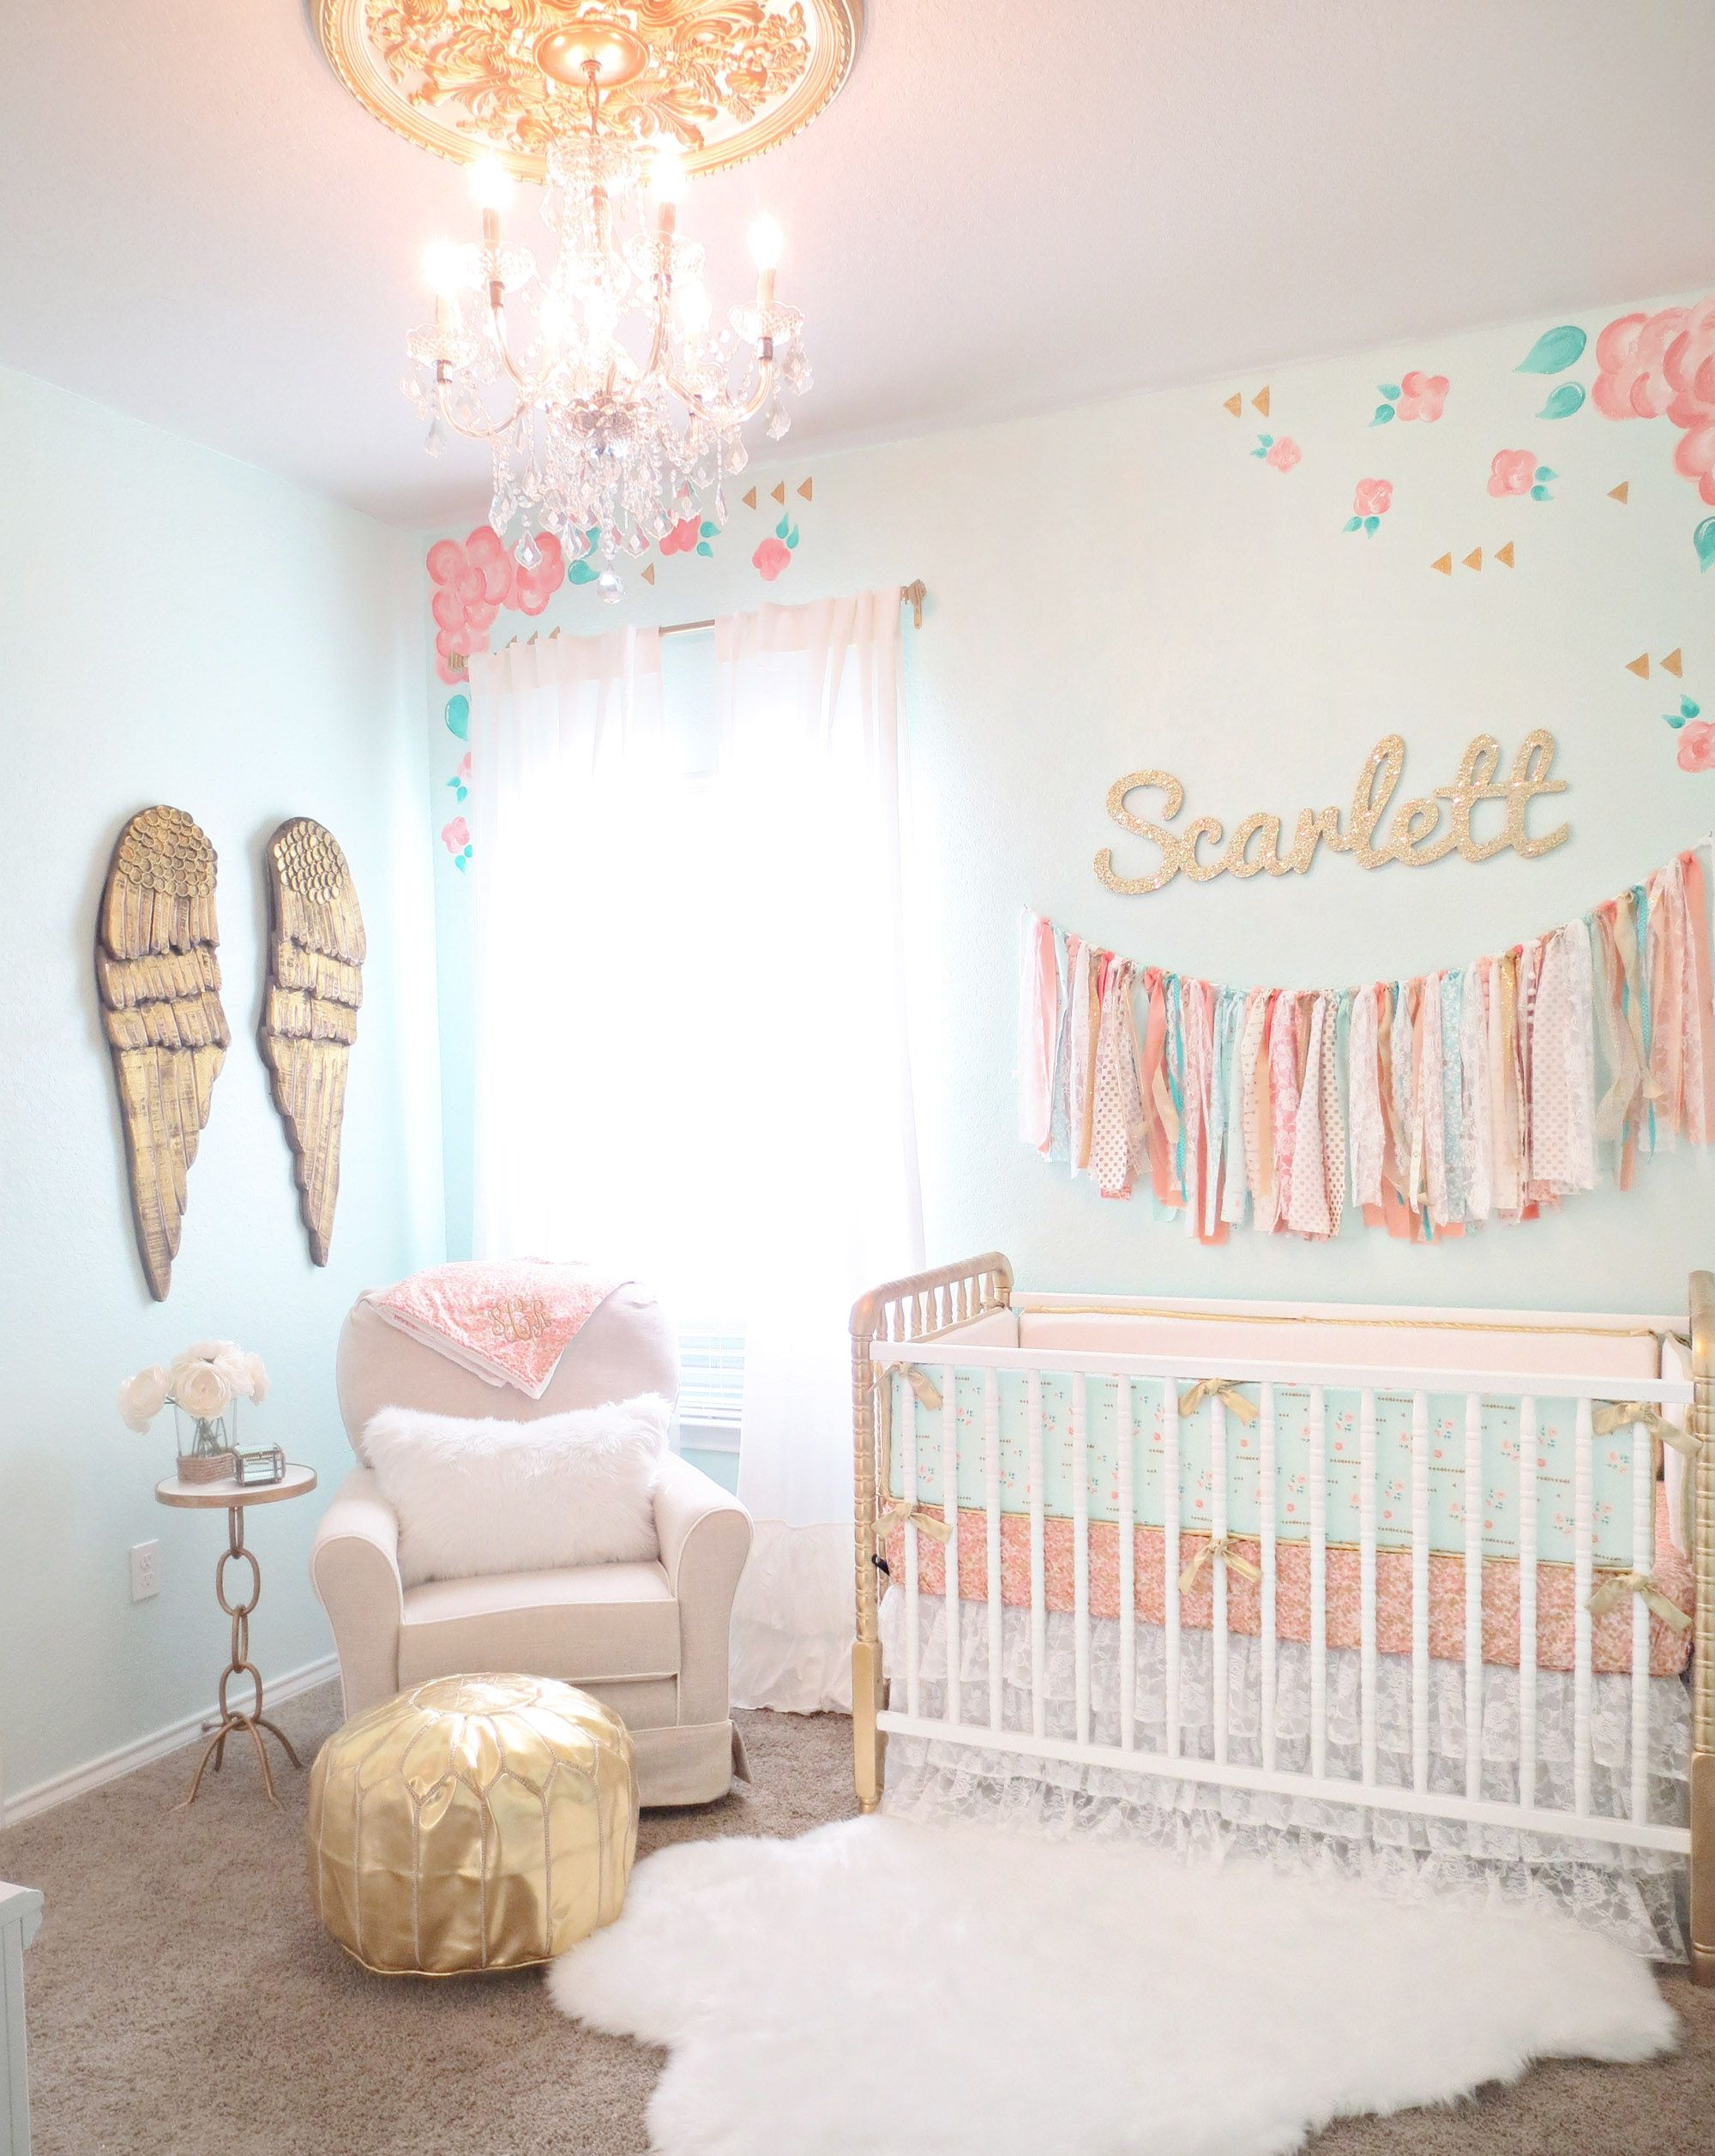 Nursery Design \u0026 Baby Bedding Style | Nursery, Floral and Gold